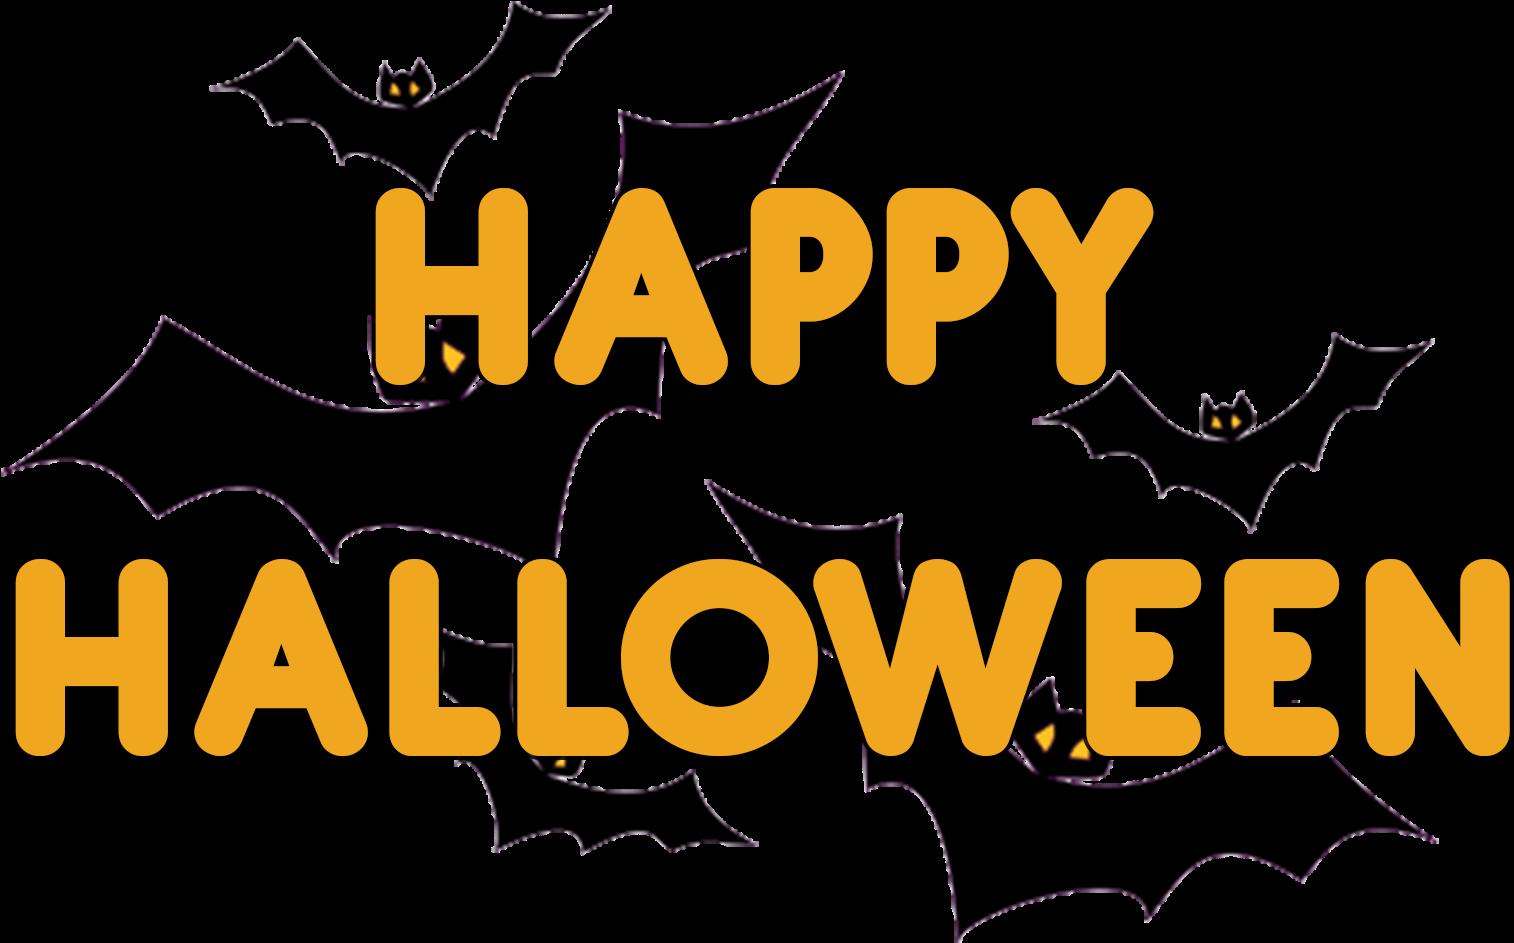 Transparent Happy Halloween Bat (1920x1200), Png Download